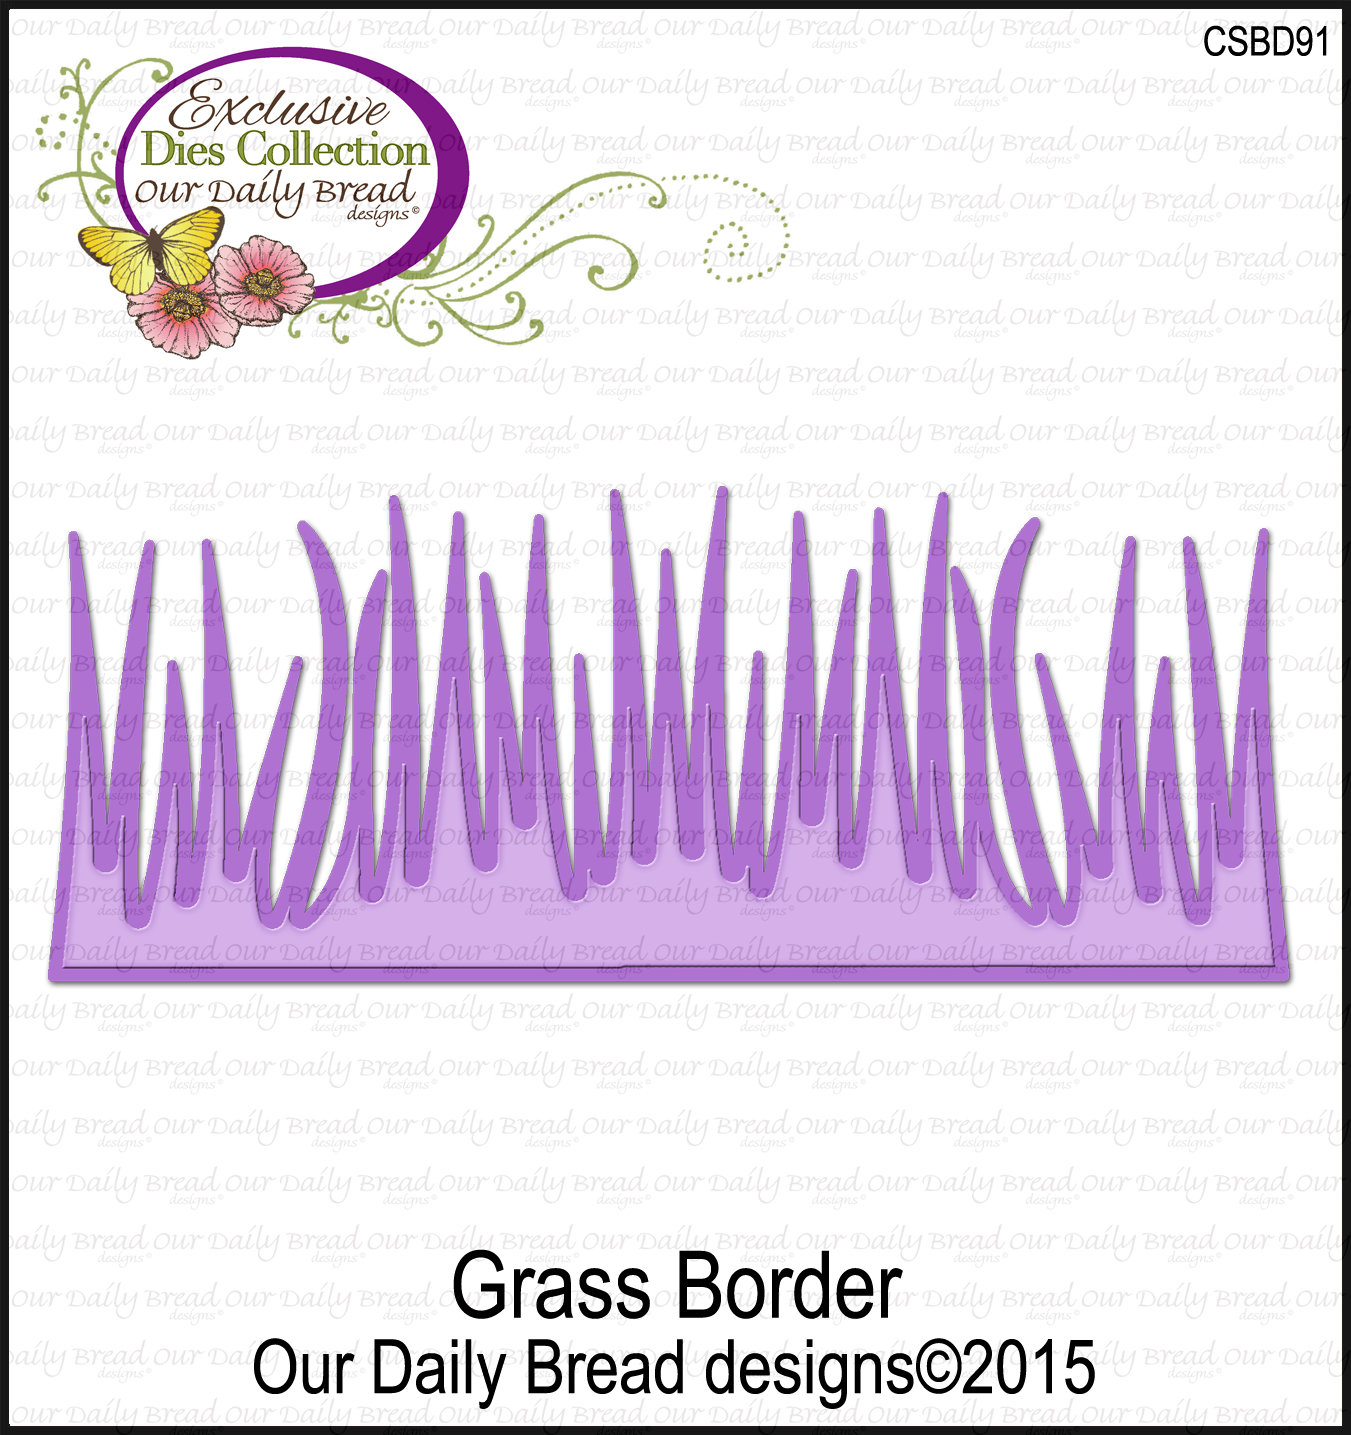 Our Daily Bread Designs Custom Grass Border Die